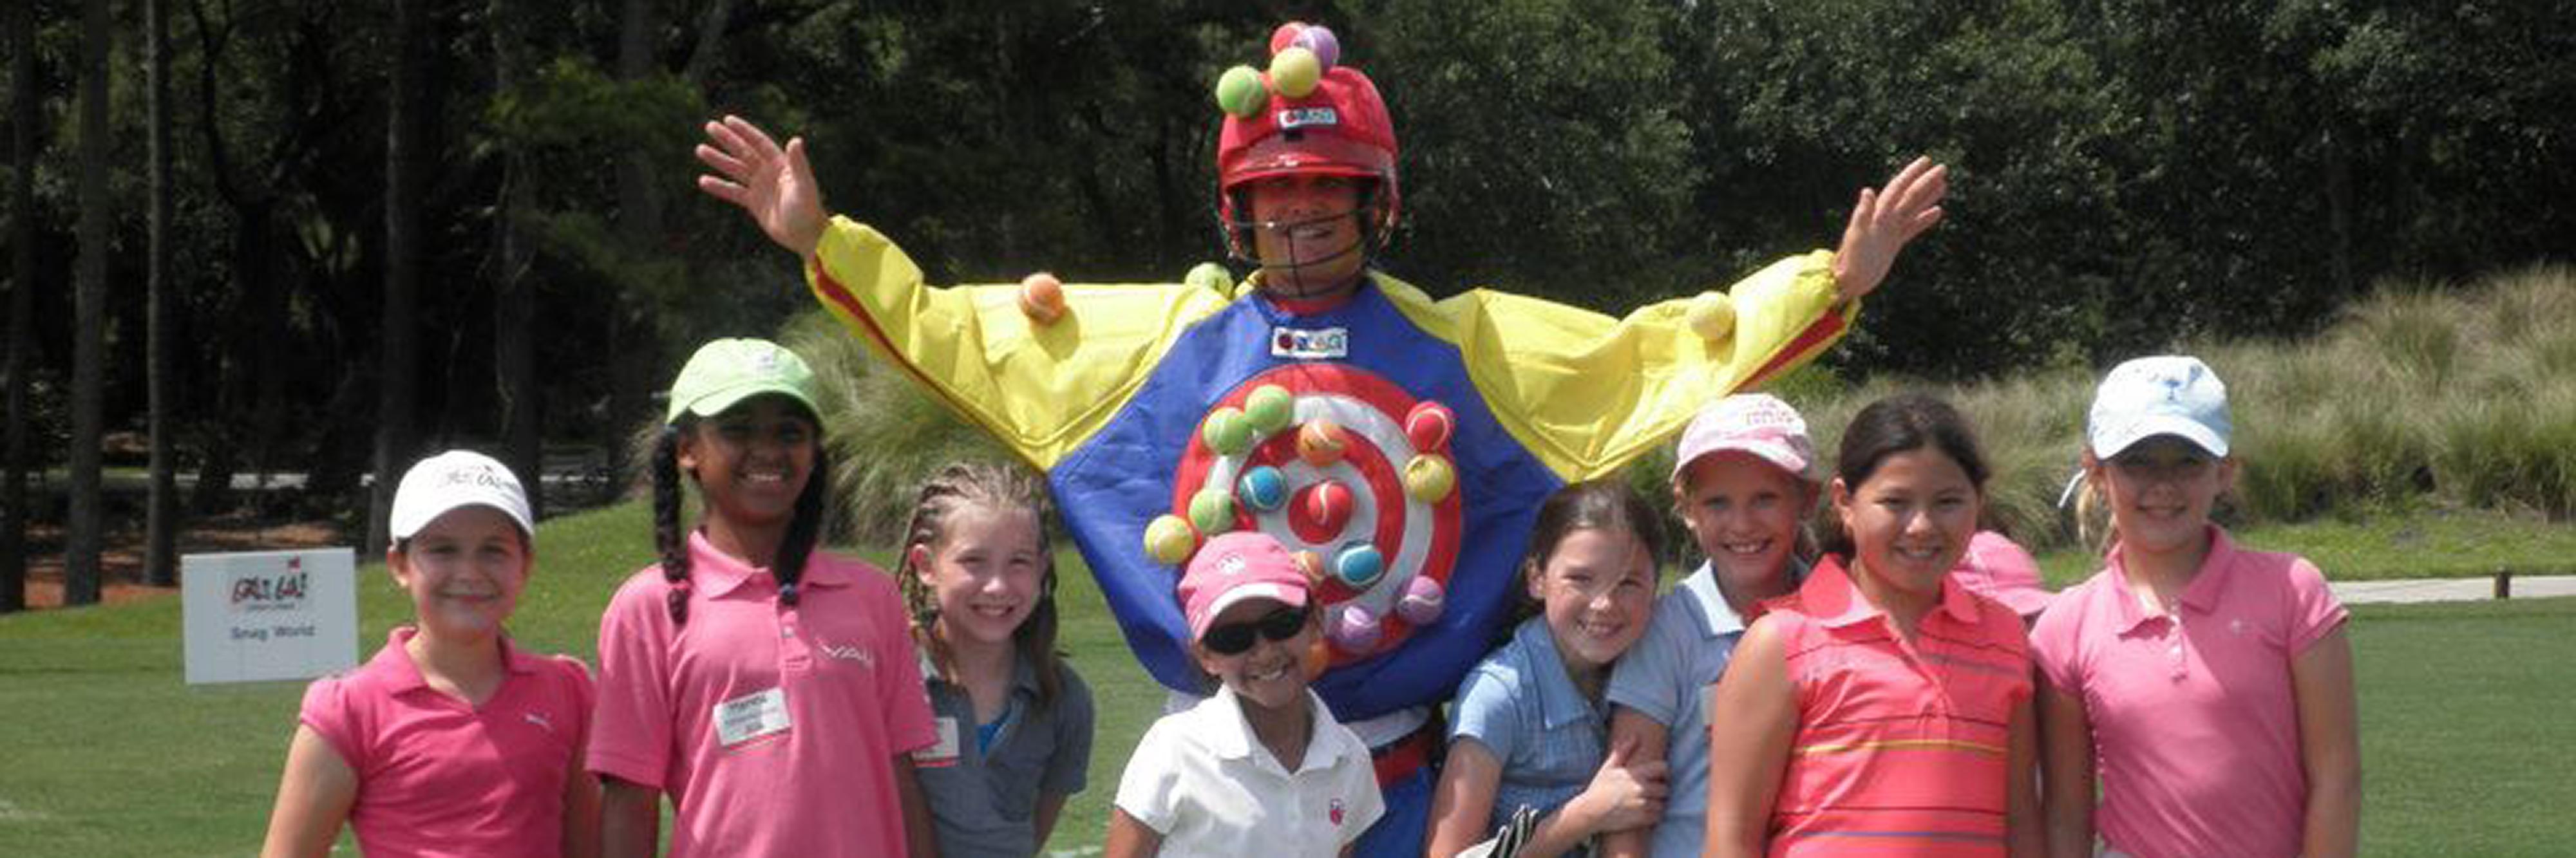 Events- Girls Golf Days